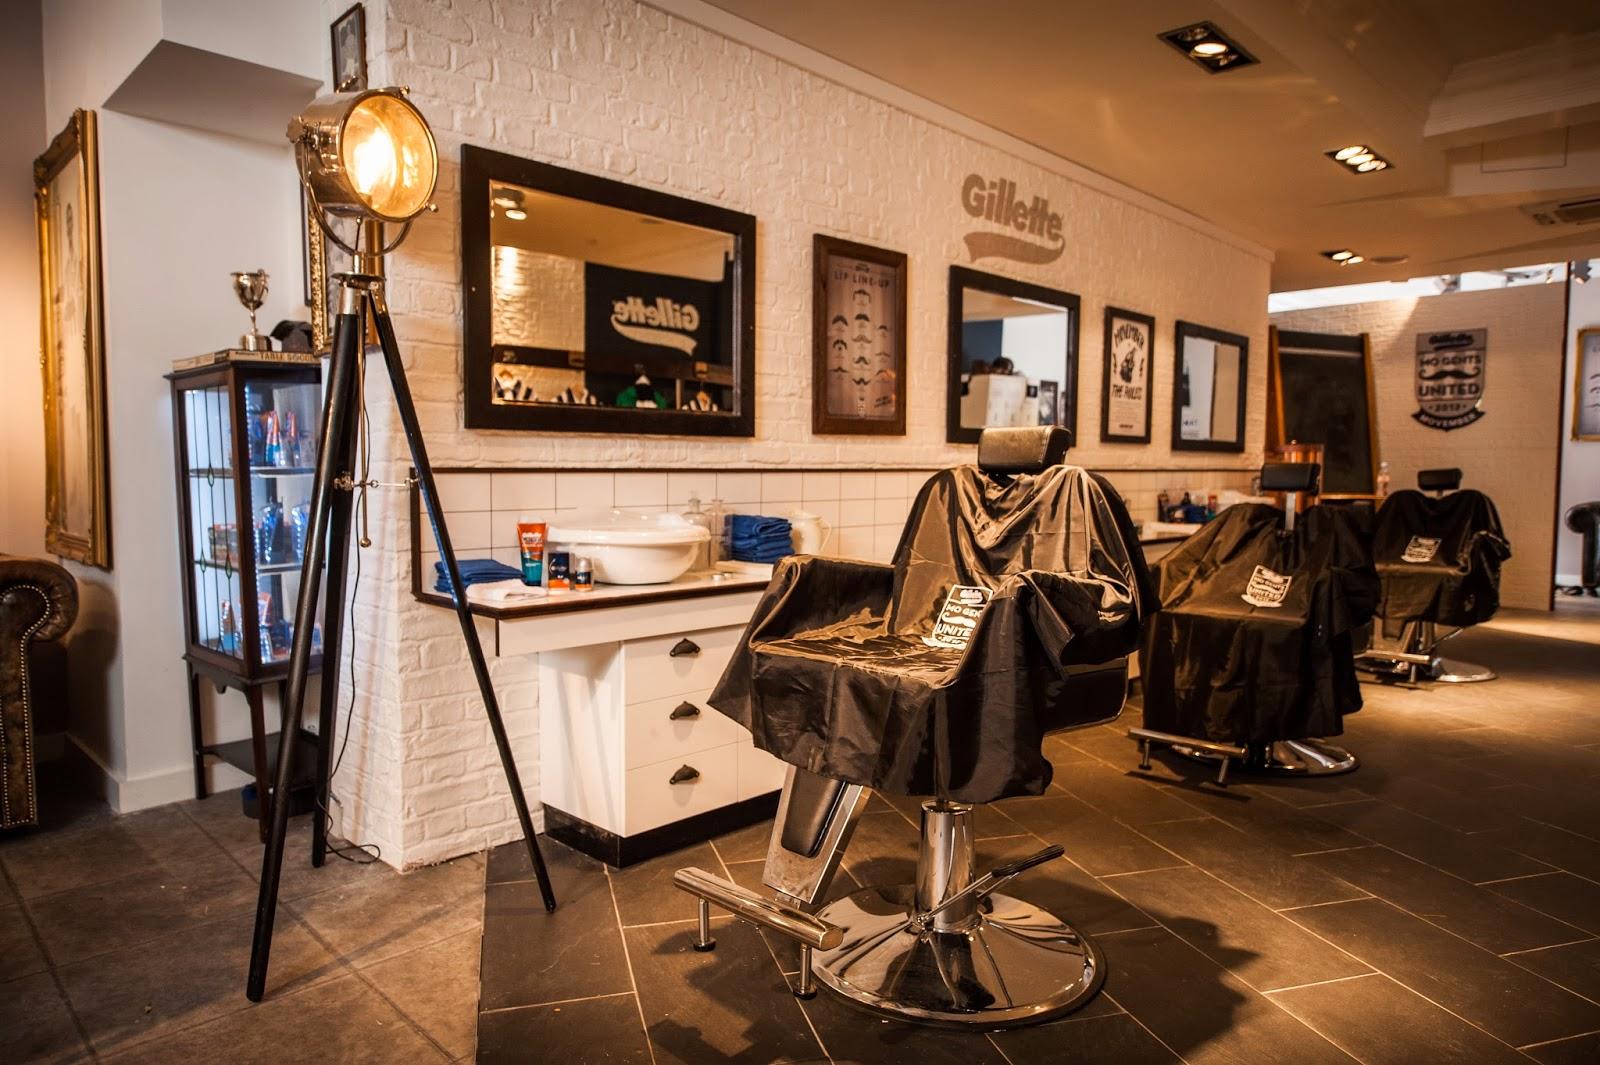 London pop ups gillette 39 s movember pop up barbershop in for Interior stylist london